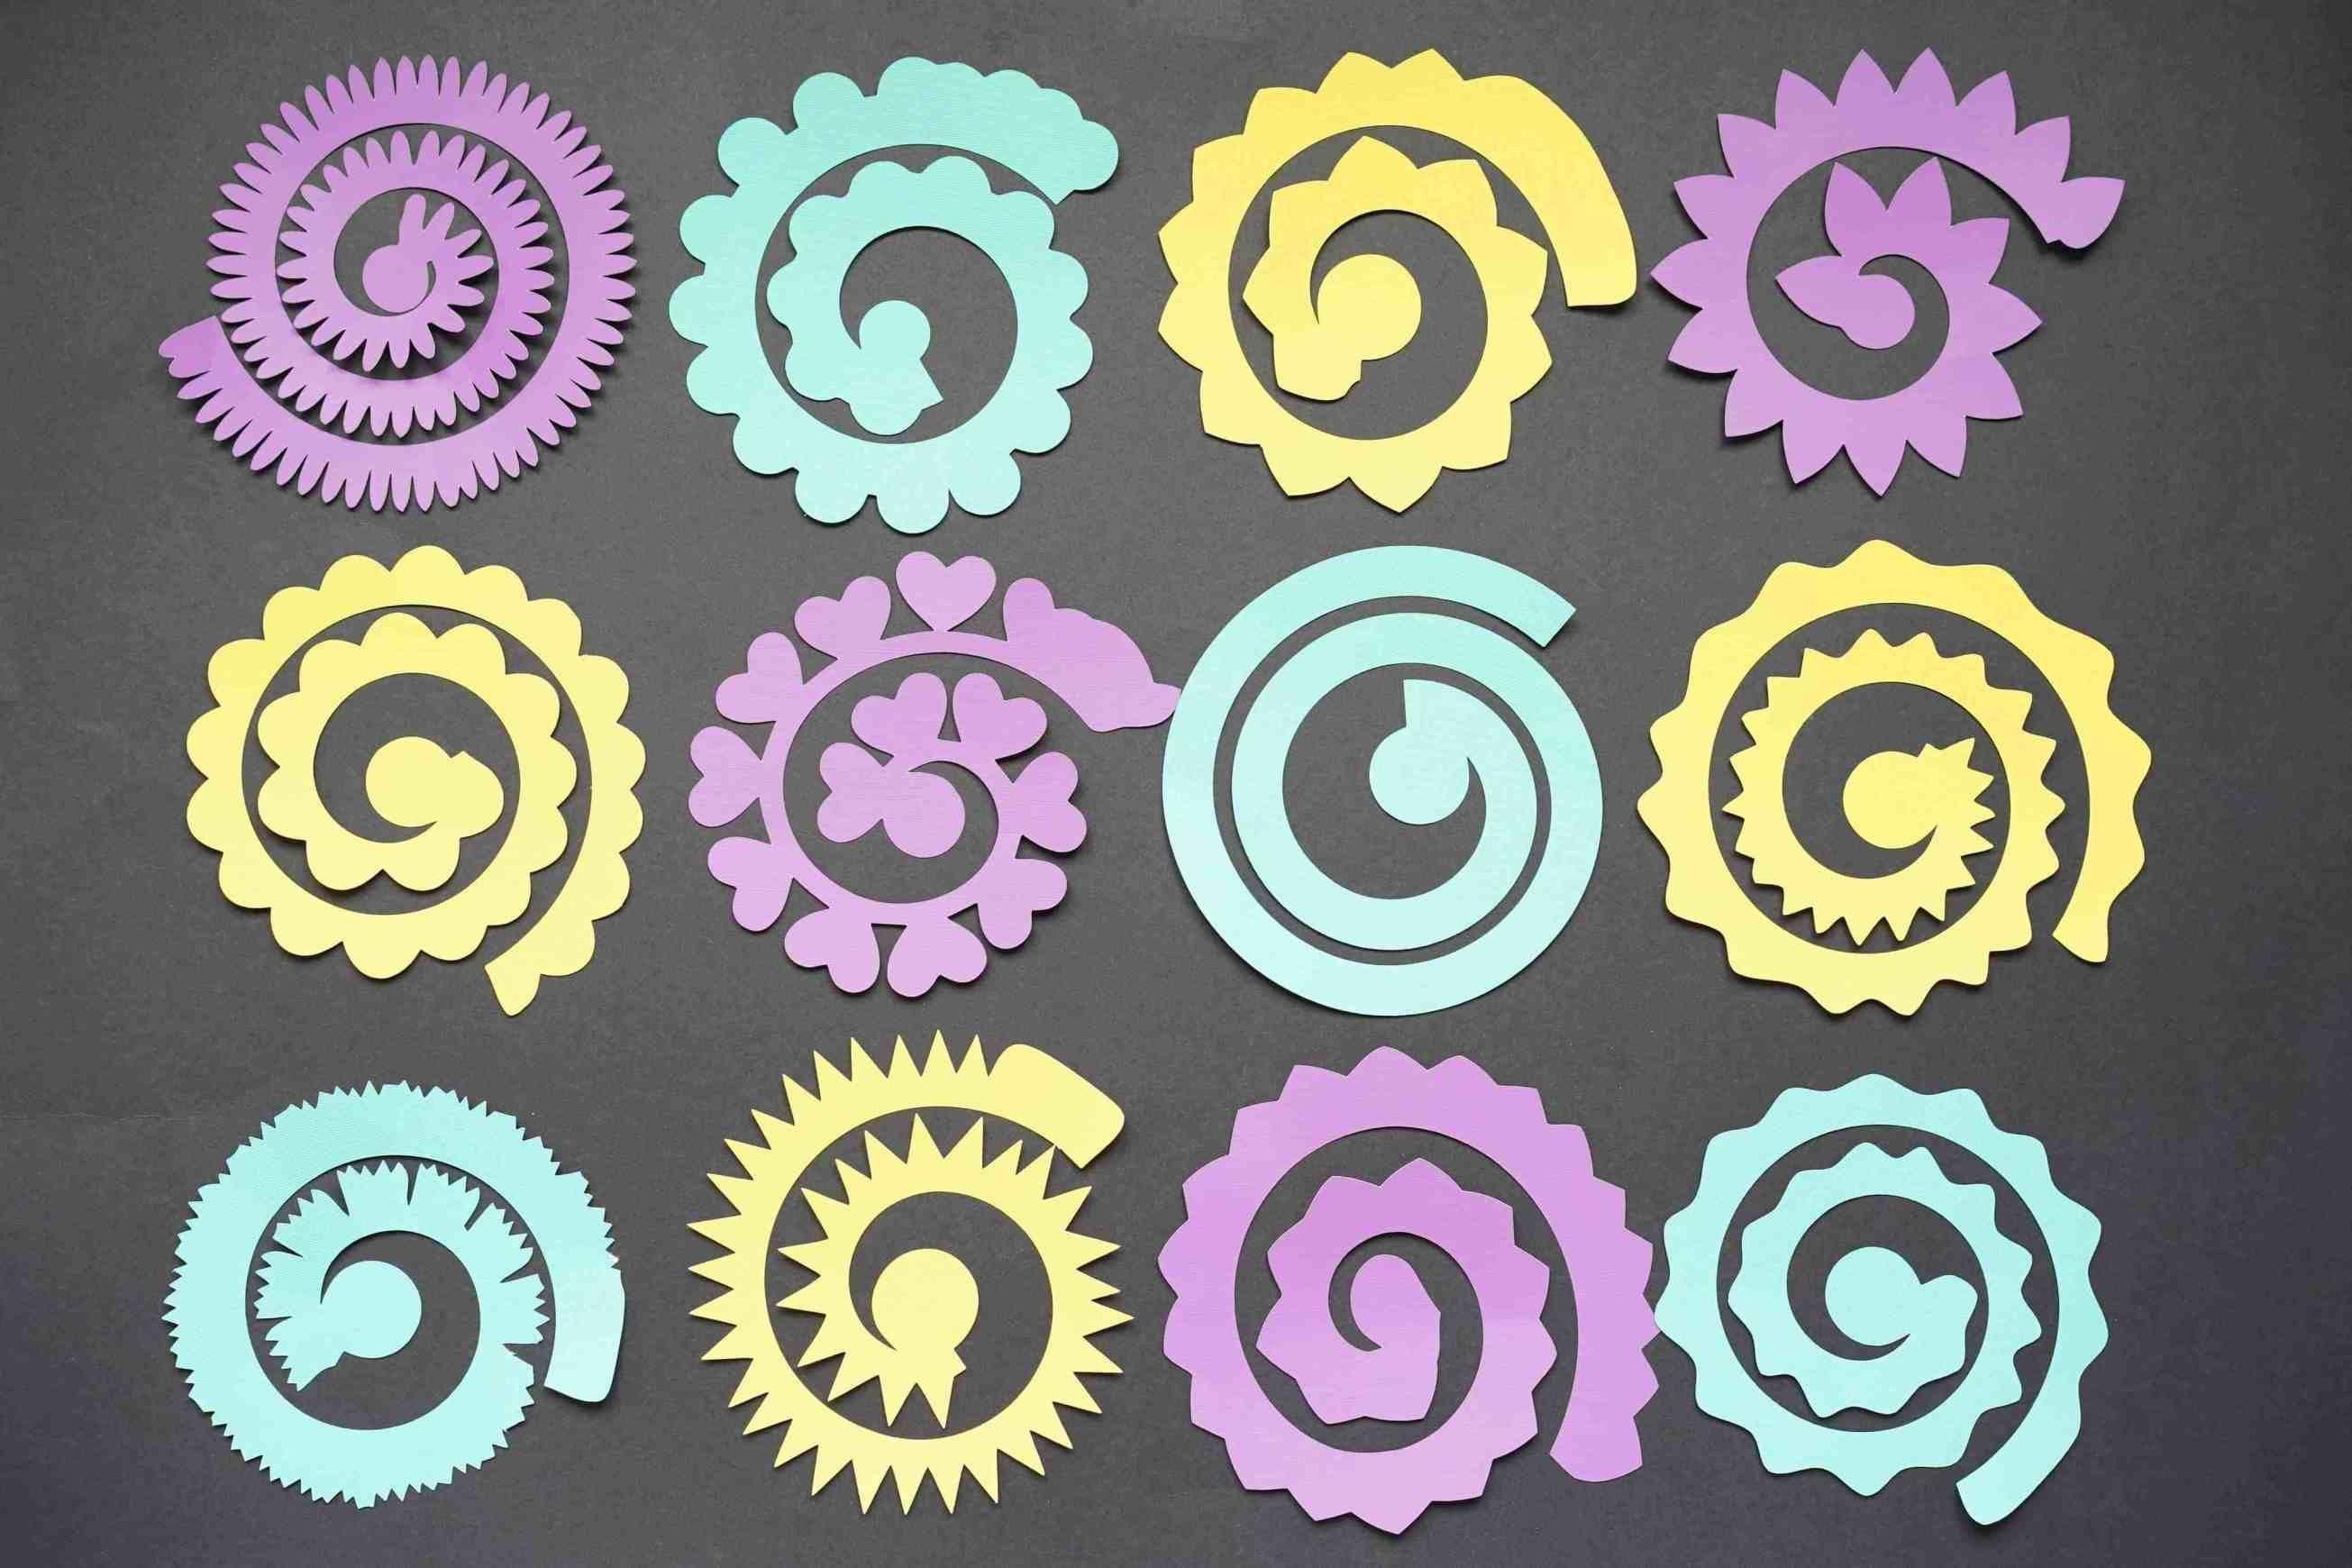 003 Sensational Free Rolled Paper Flower Template For Cricut Inspiration Full